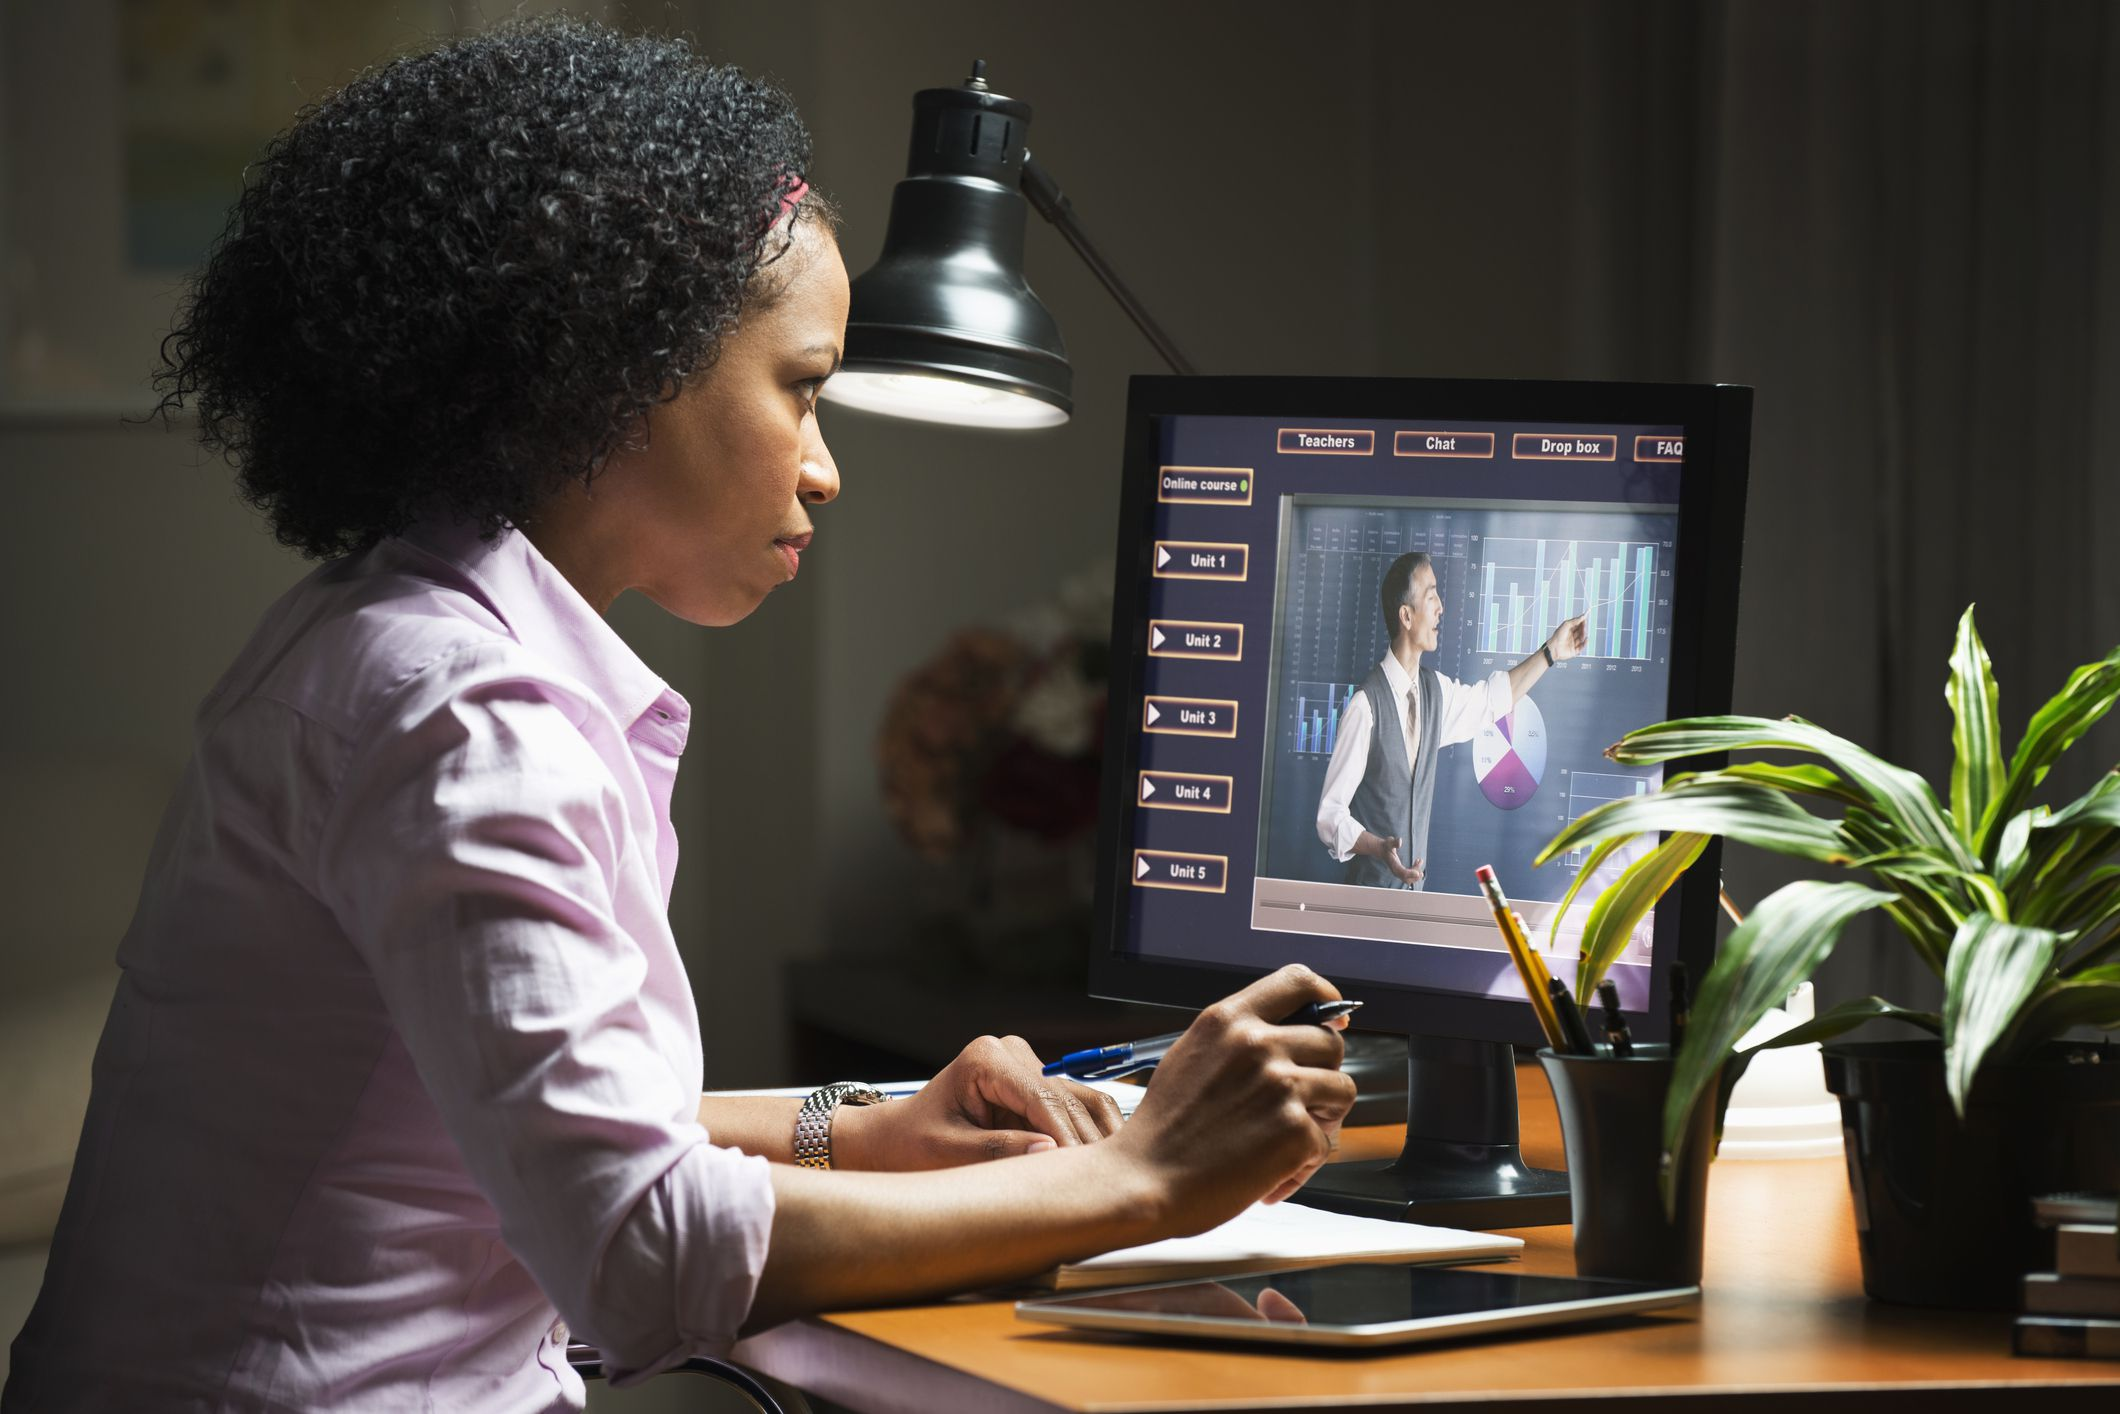 Online homework help for elementary students